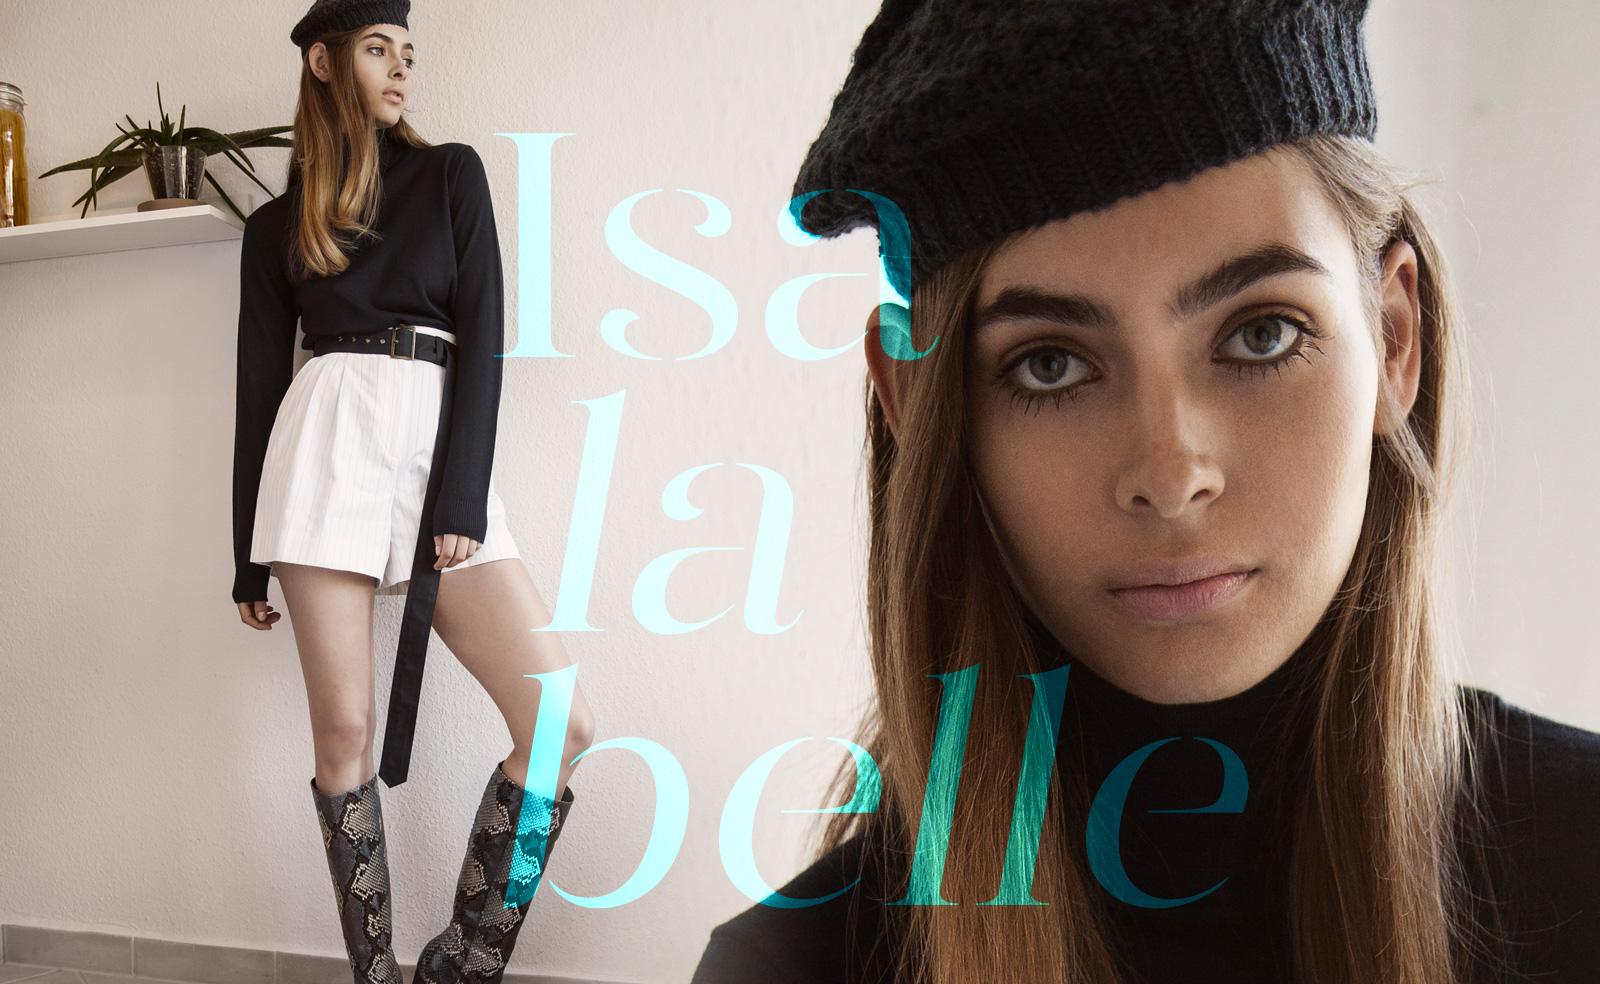 Isa La Belle Fashion Editorial The Clique Suite